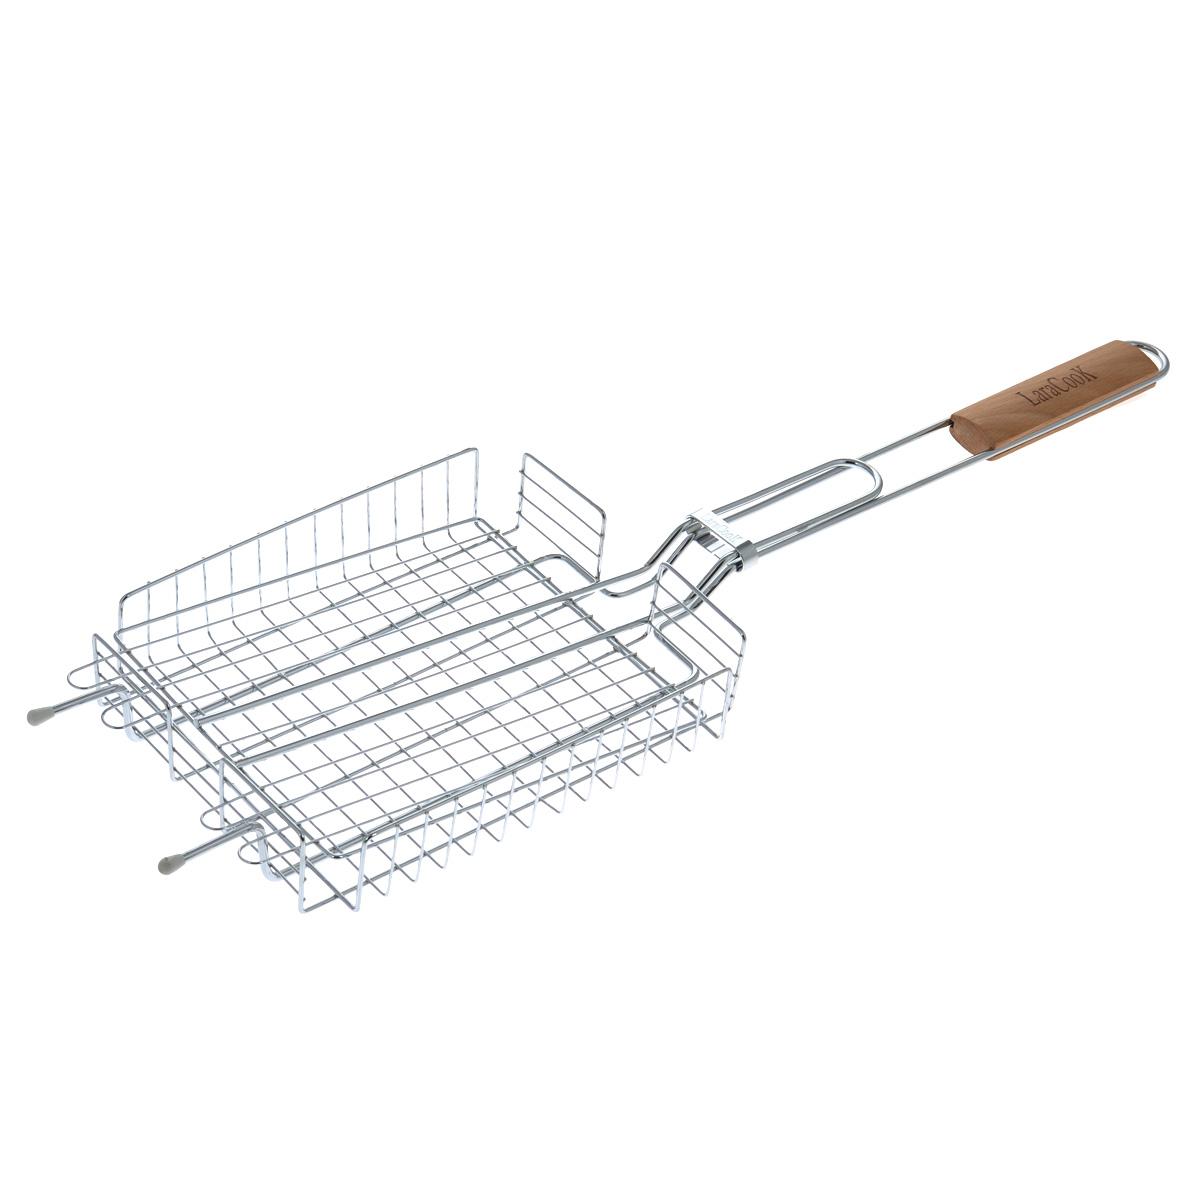 "Решетка-гриль глубокая ""Laracook"", 25 см х 20 см LC-1300"